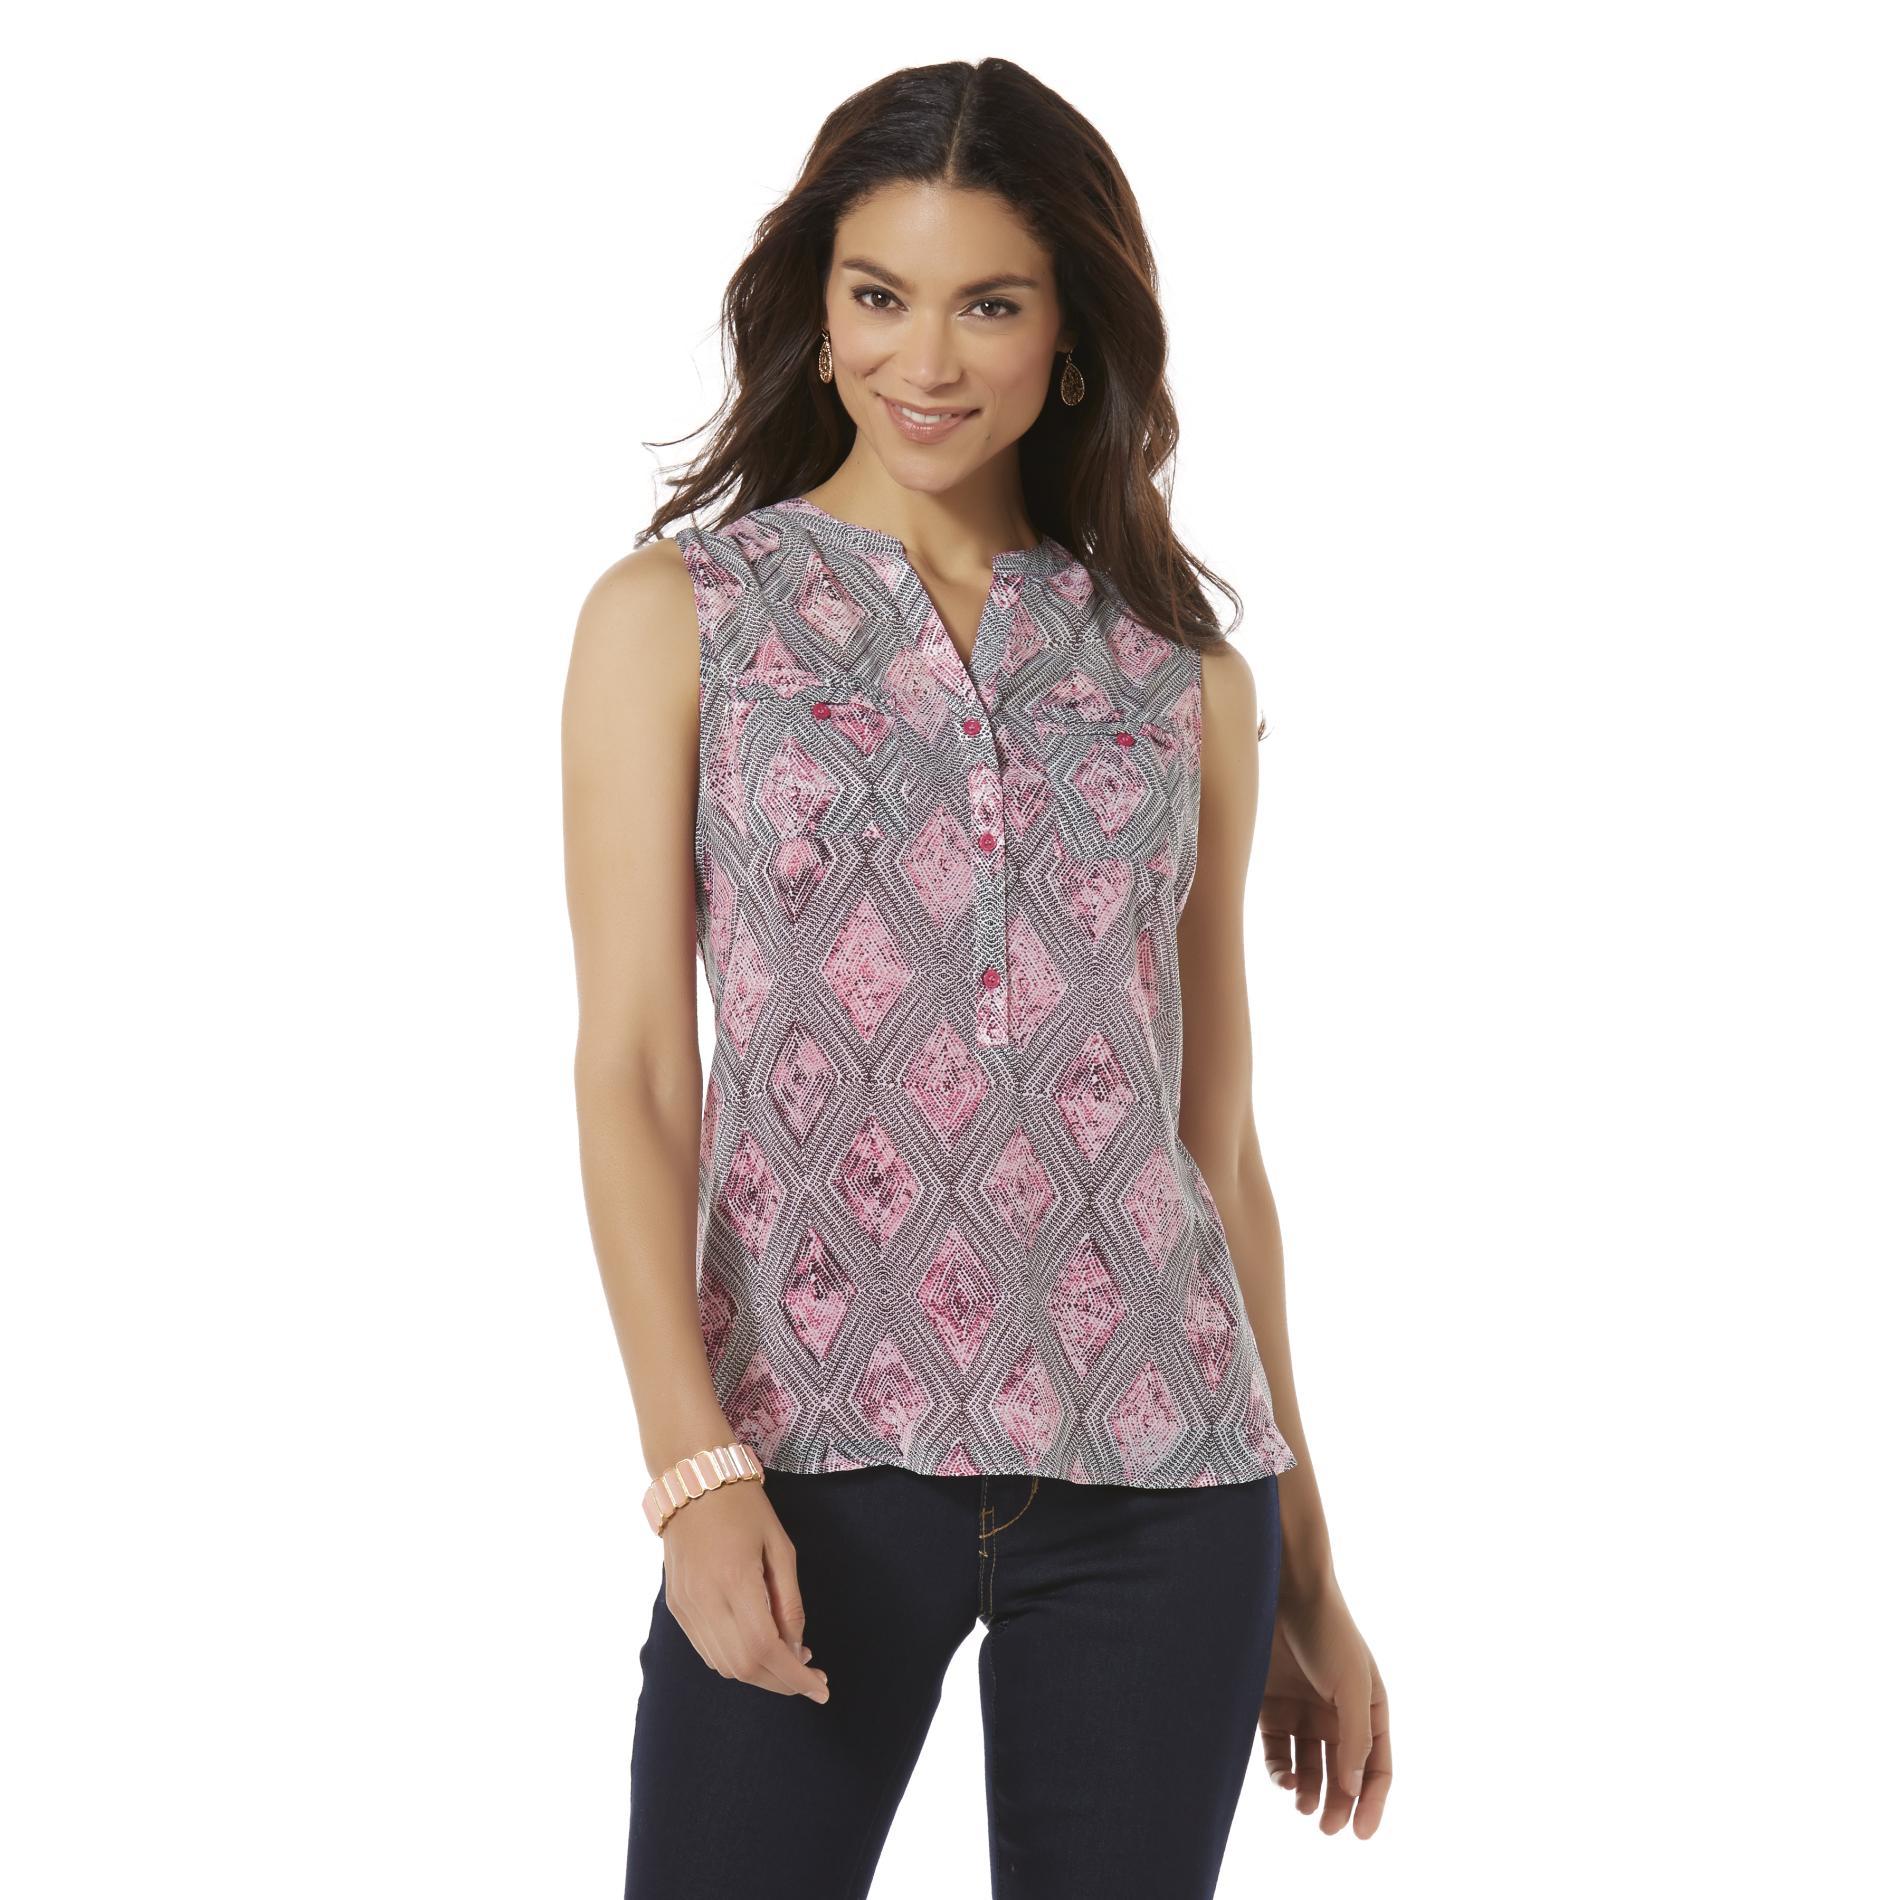 Covington Women's Sleeveless Top & Camisole - Diamond Pattern